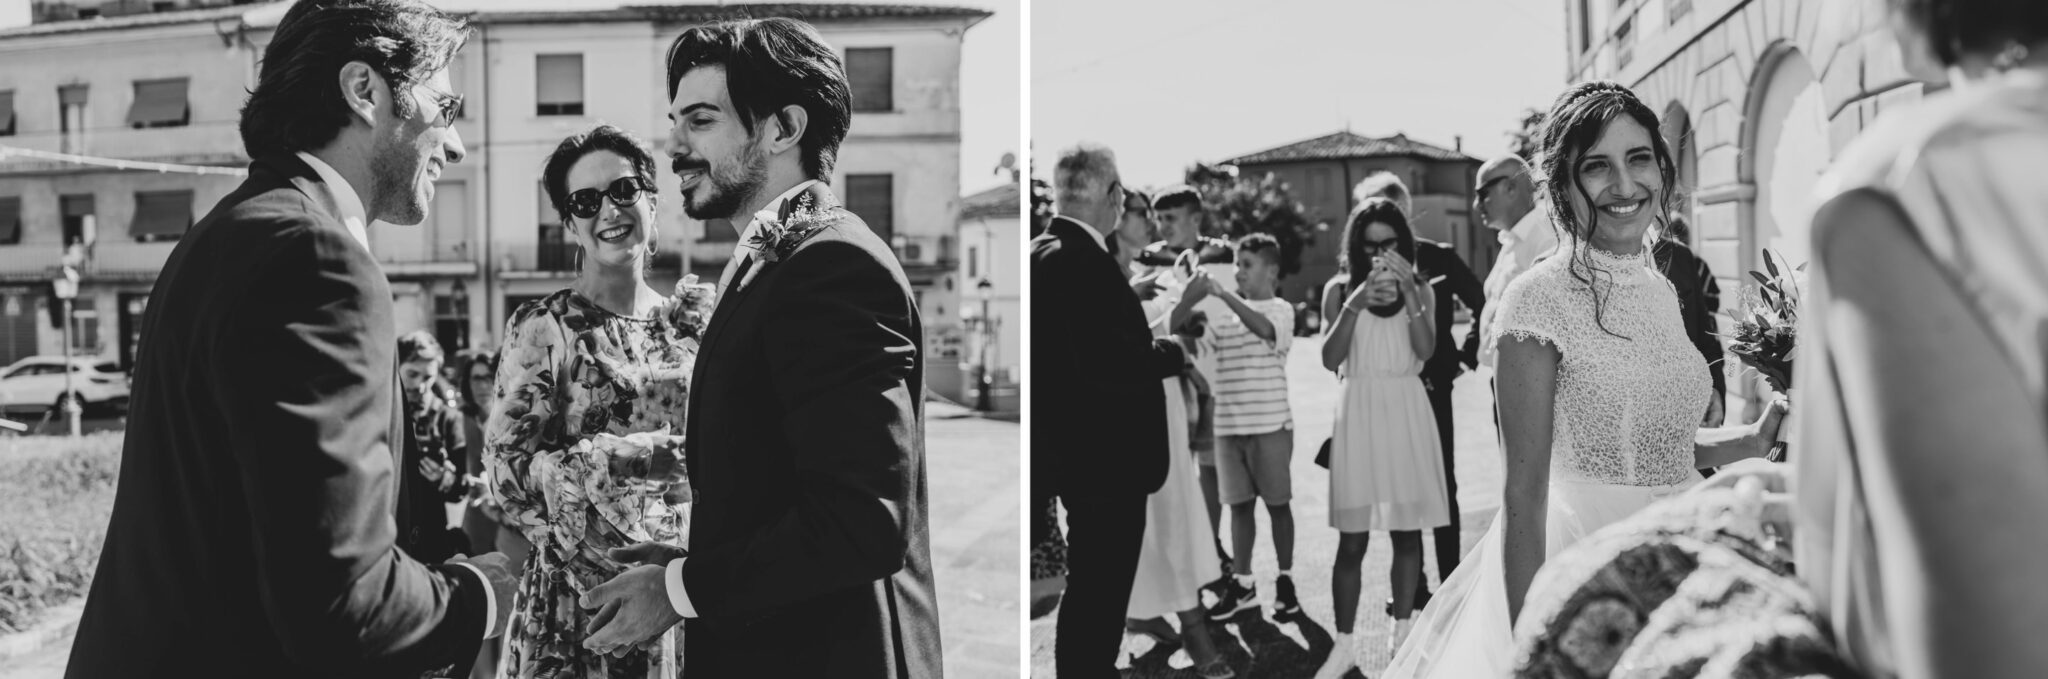 saluti durante matrimonio ad Altopascio